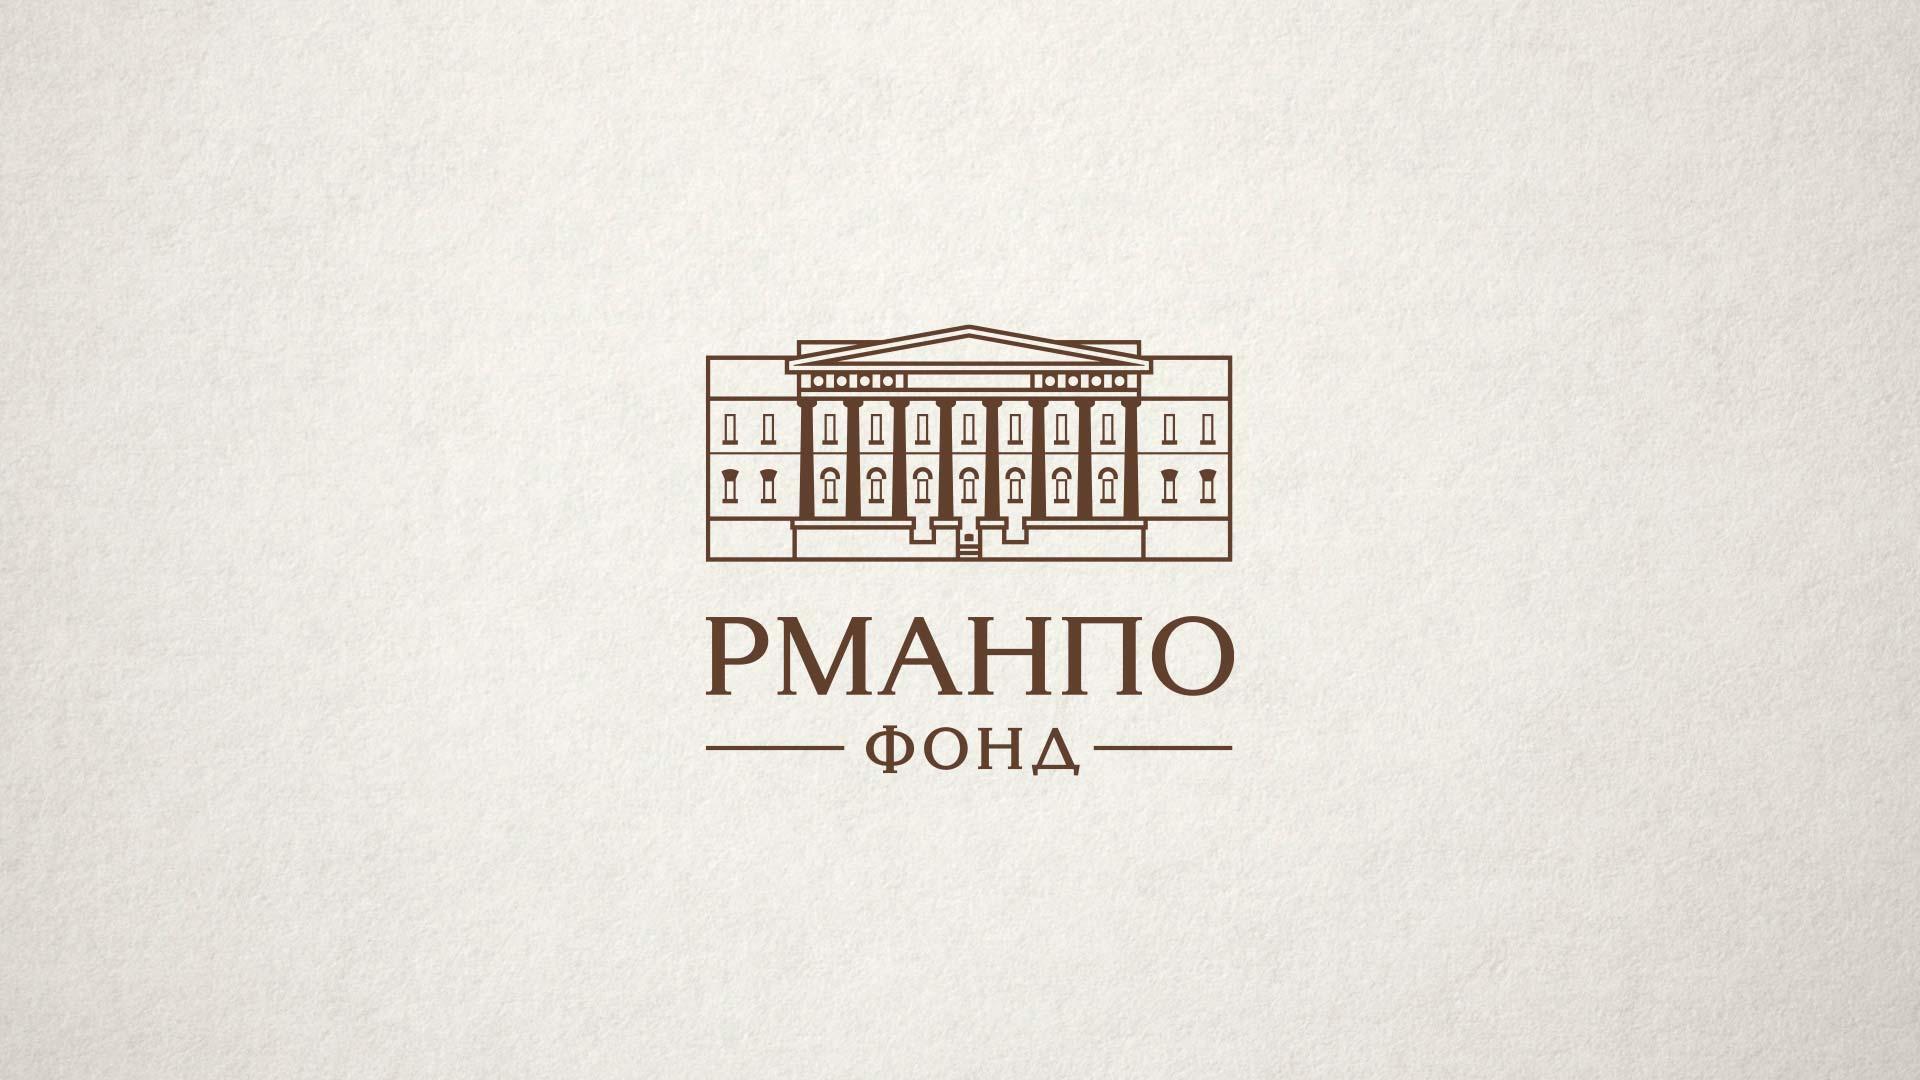 Разработка логотипа РМАНПО ФОНД - на бумаге